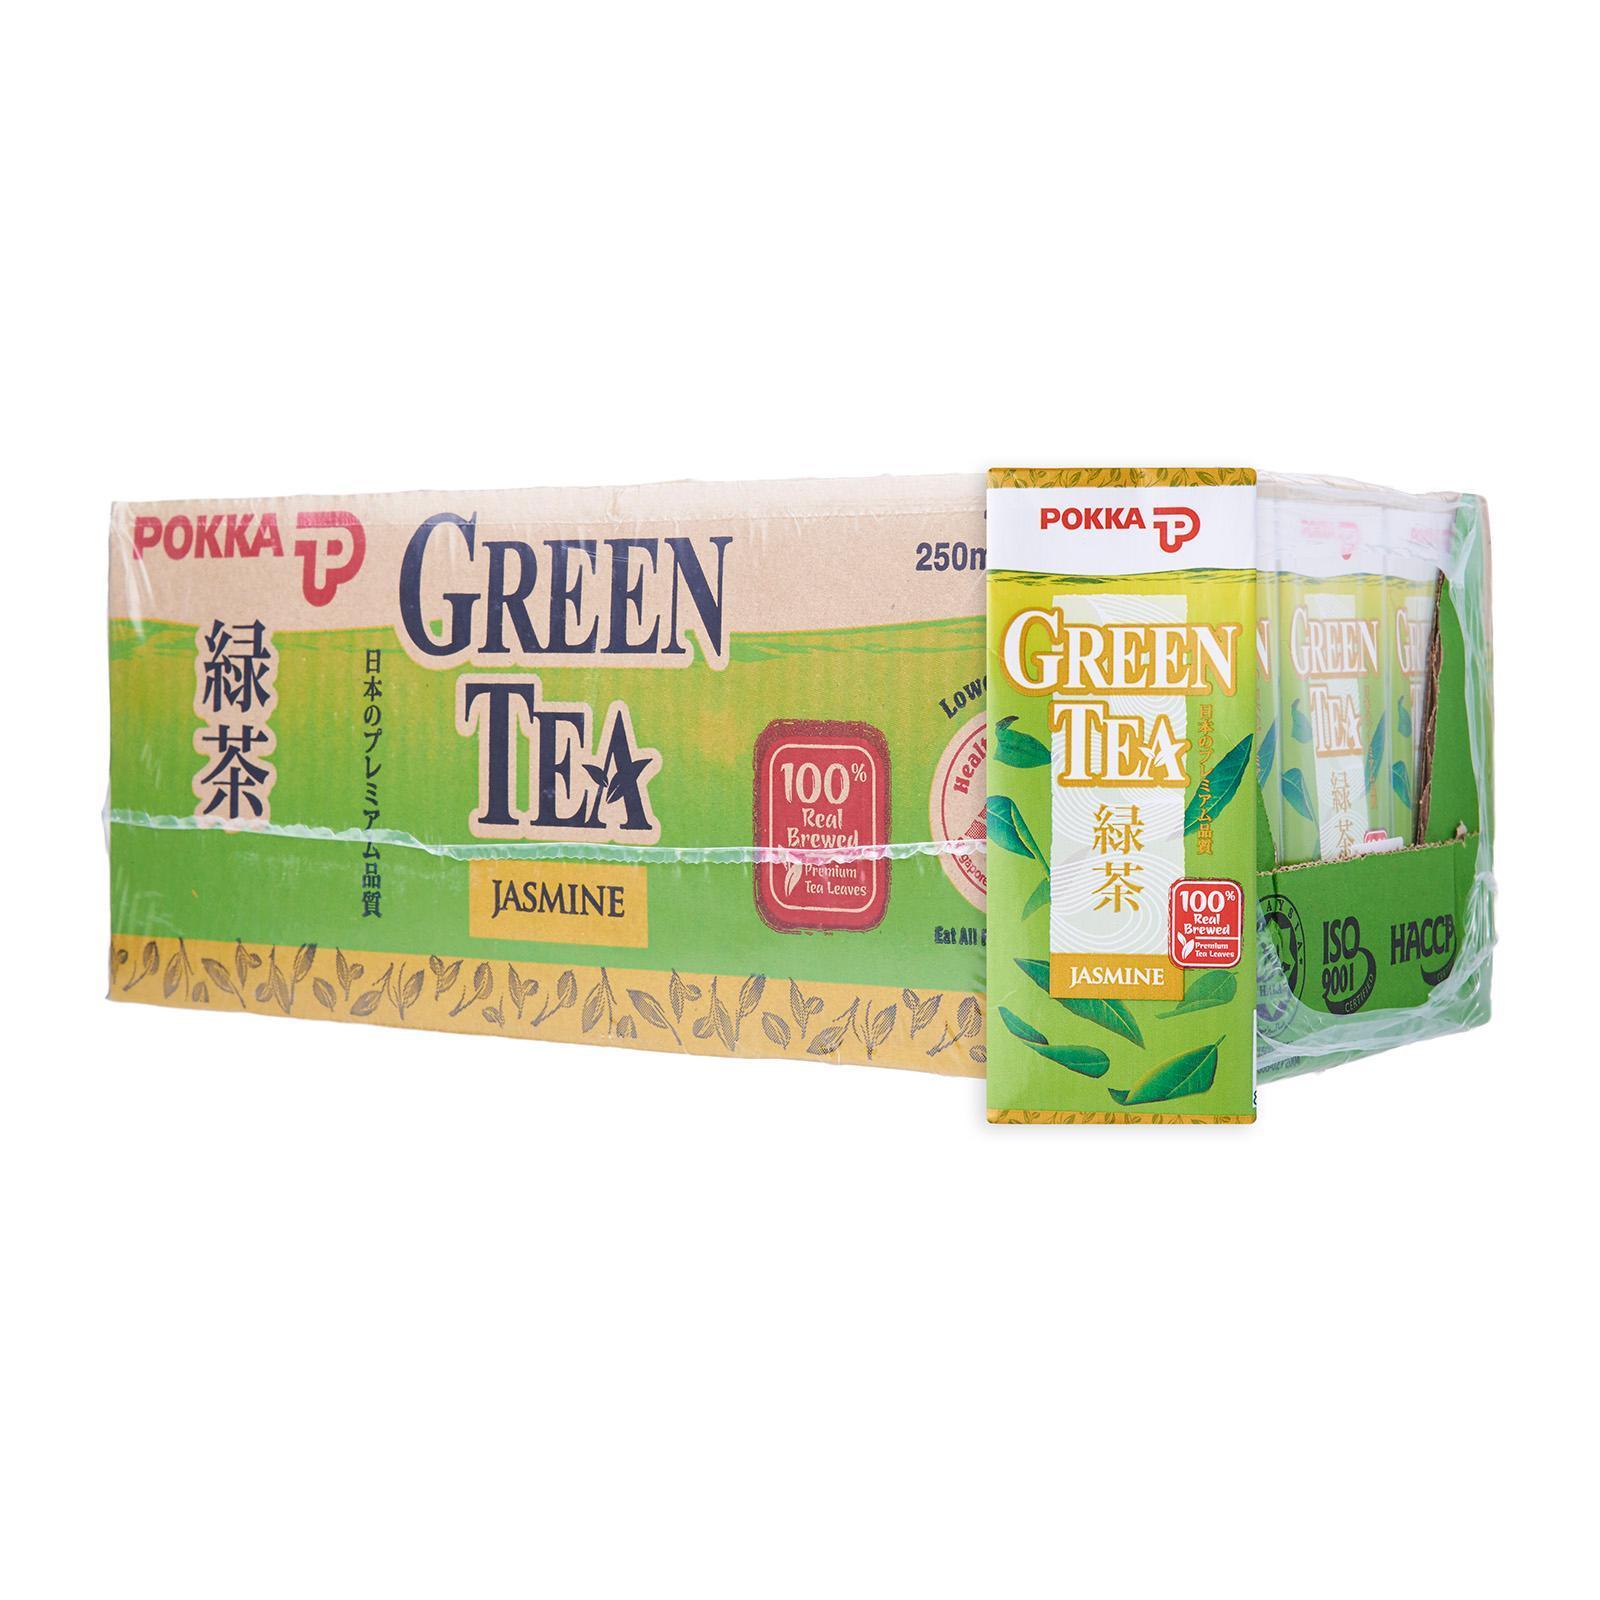 Pokka Packet Drink - Jasmine Green Tea